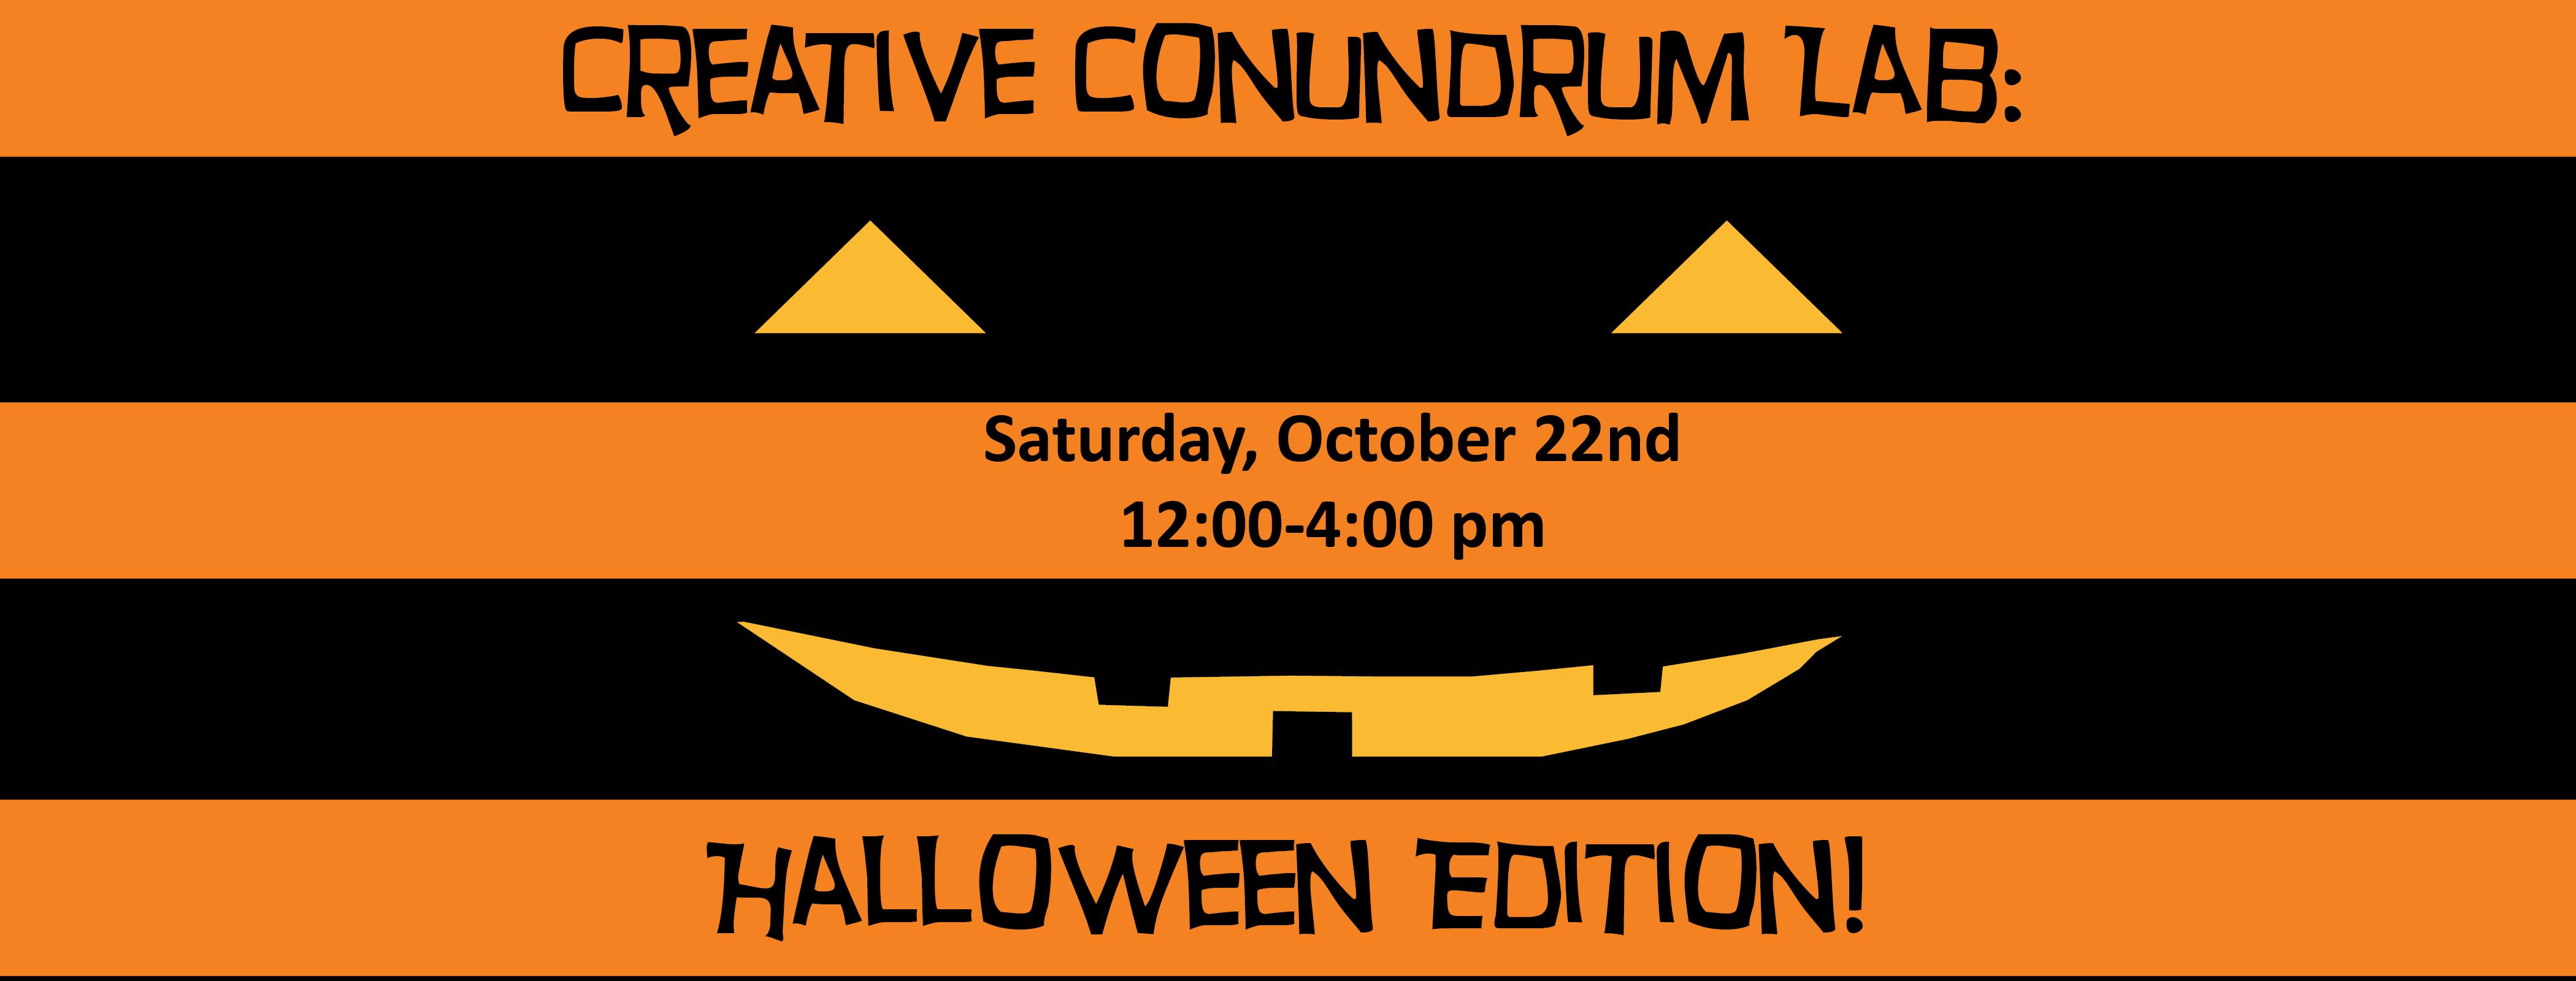 creative-conundrum-lab-halloween-edition-16p